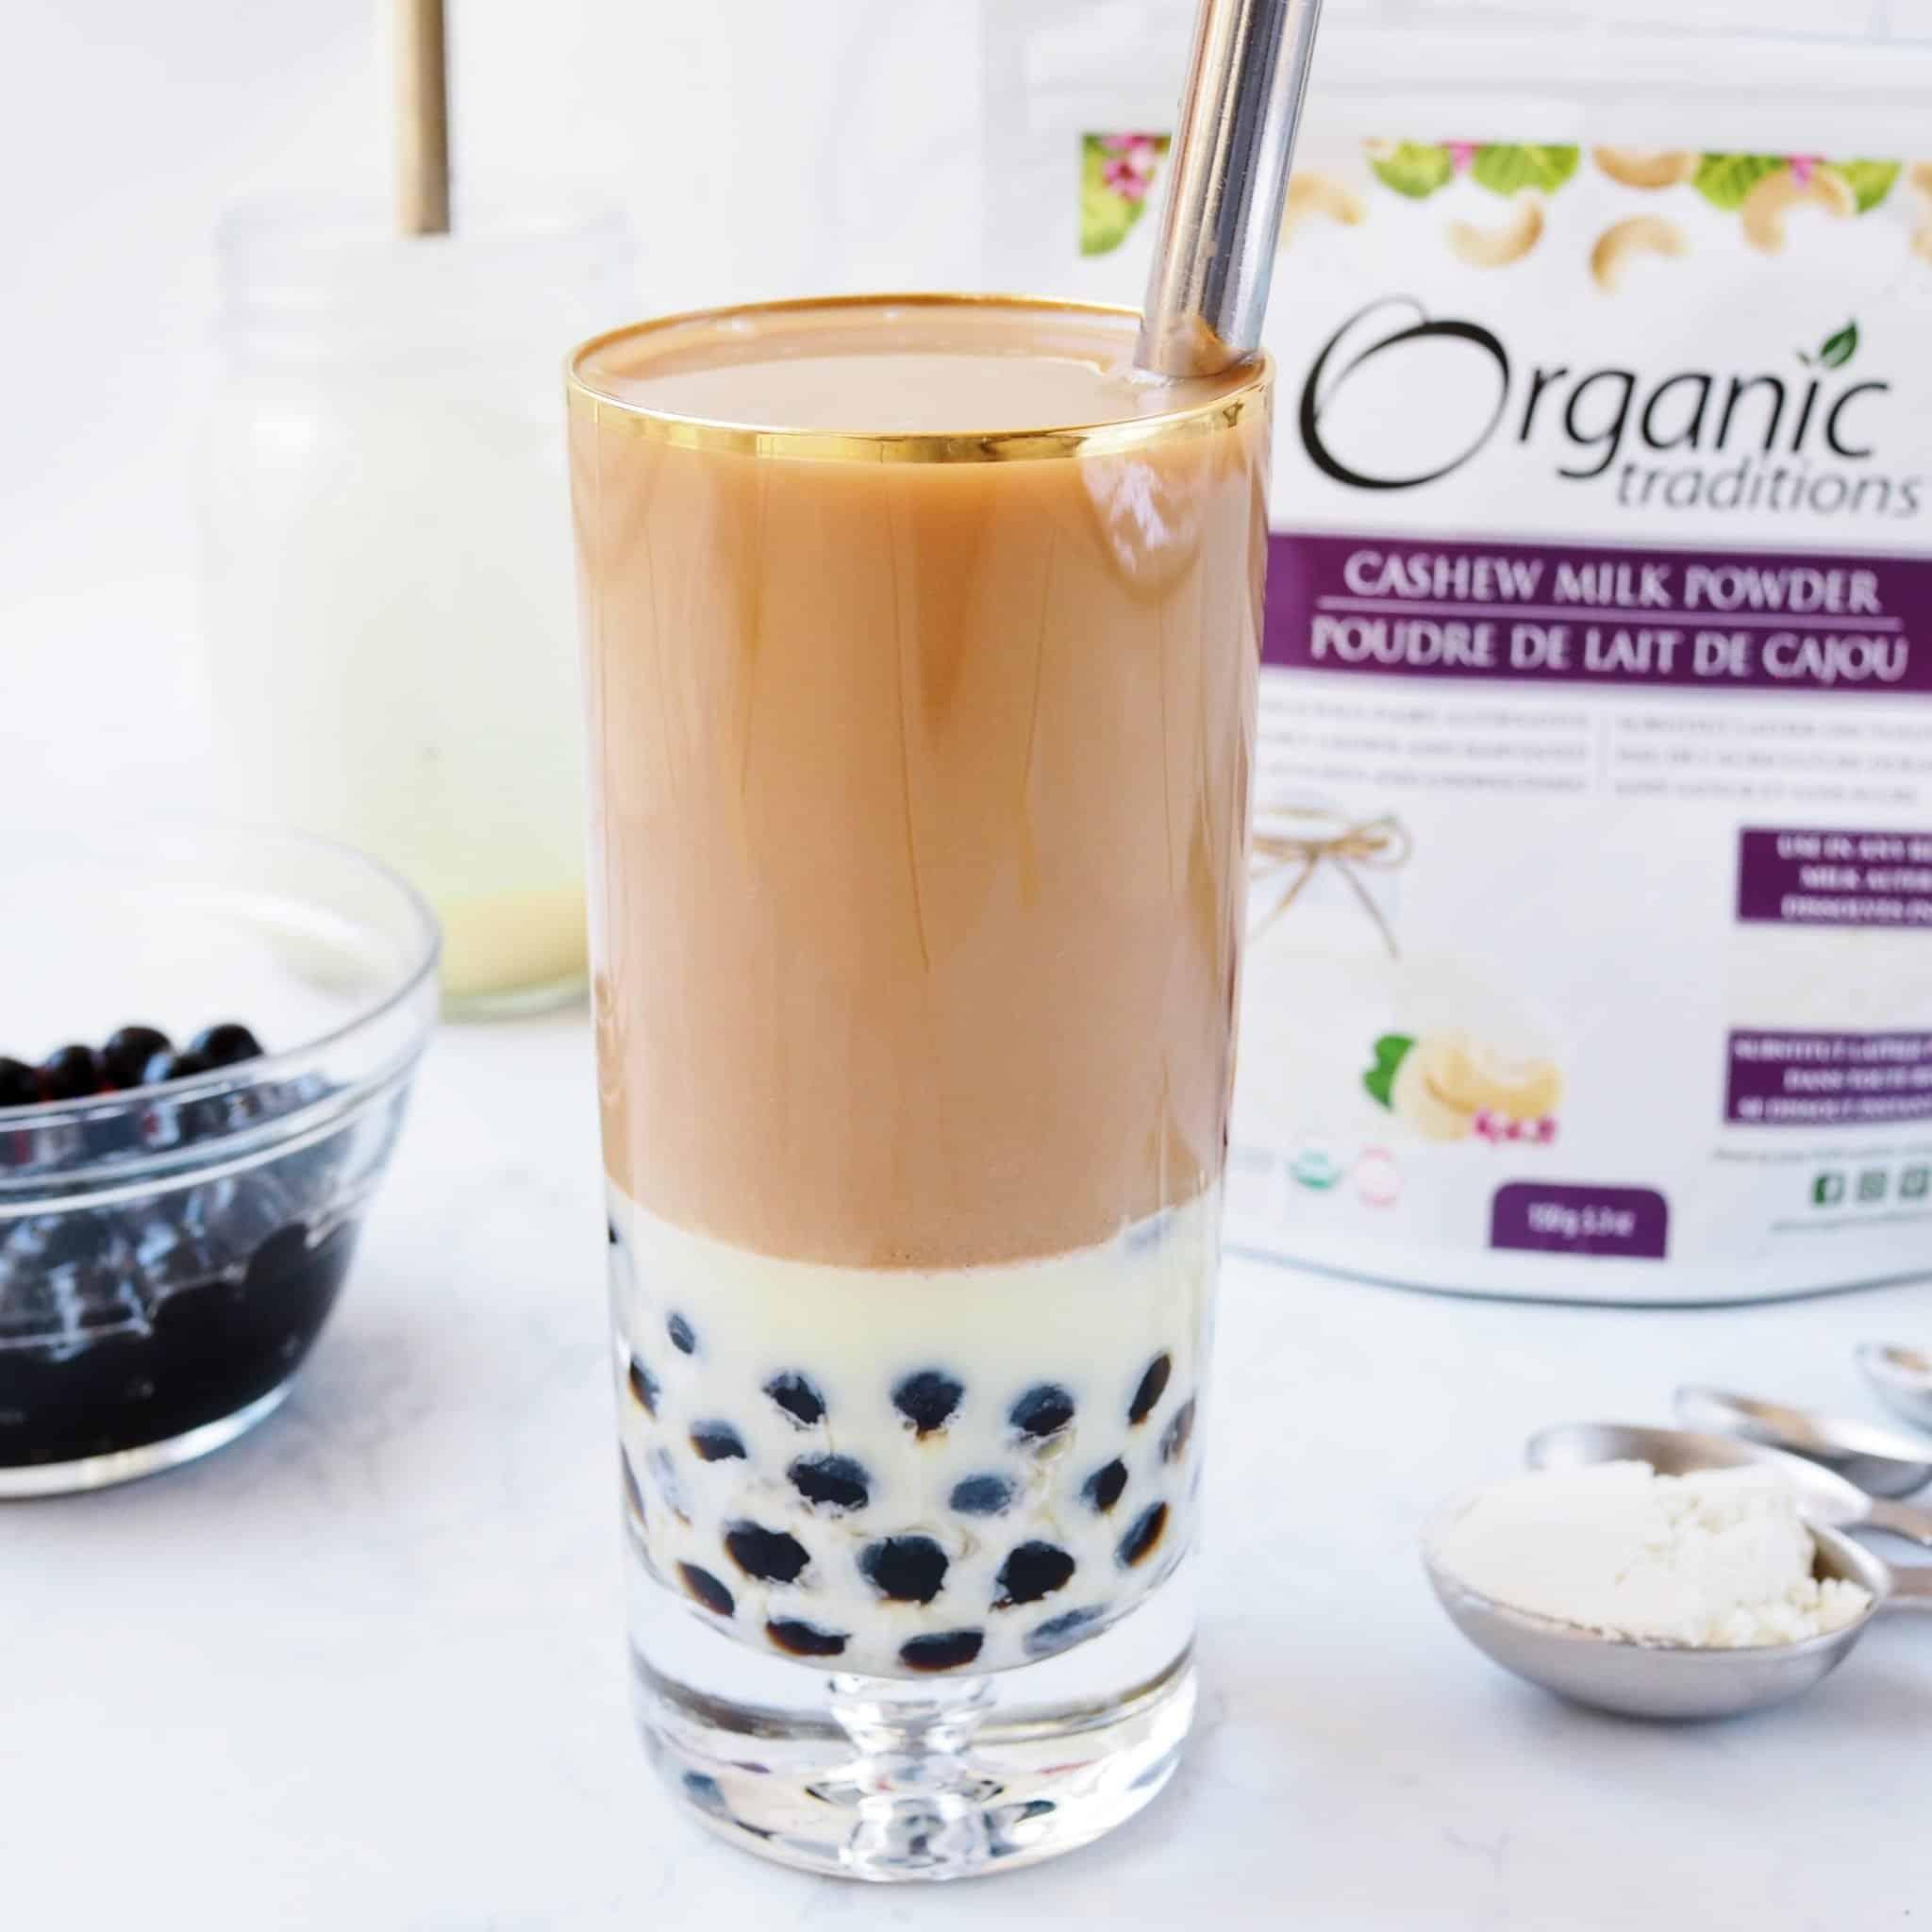 earl grey milk tea organic traditions